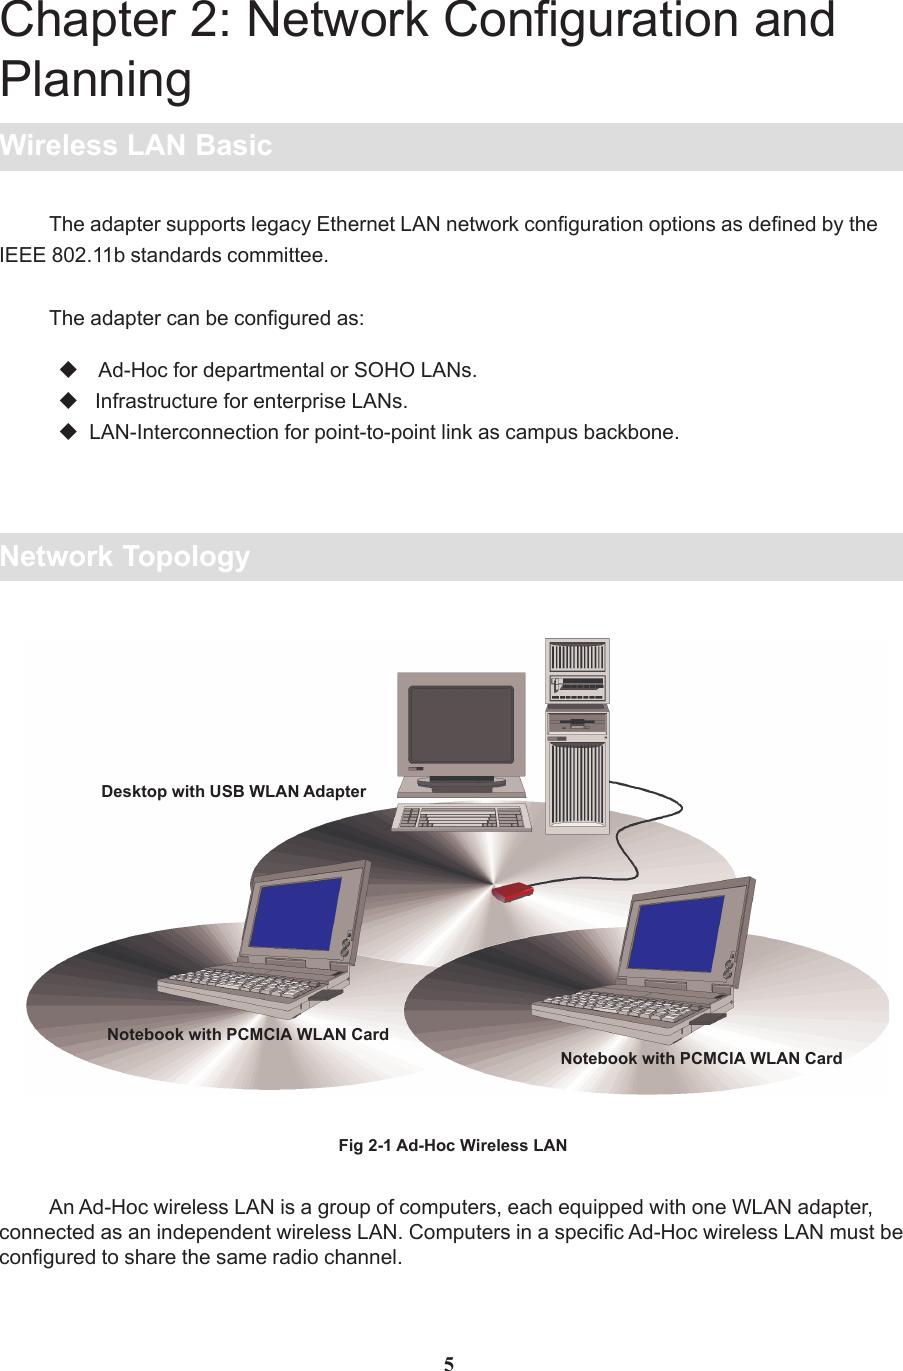 CNet Technology 0232USB611 Wireless USB Adapter User Manual